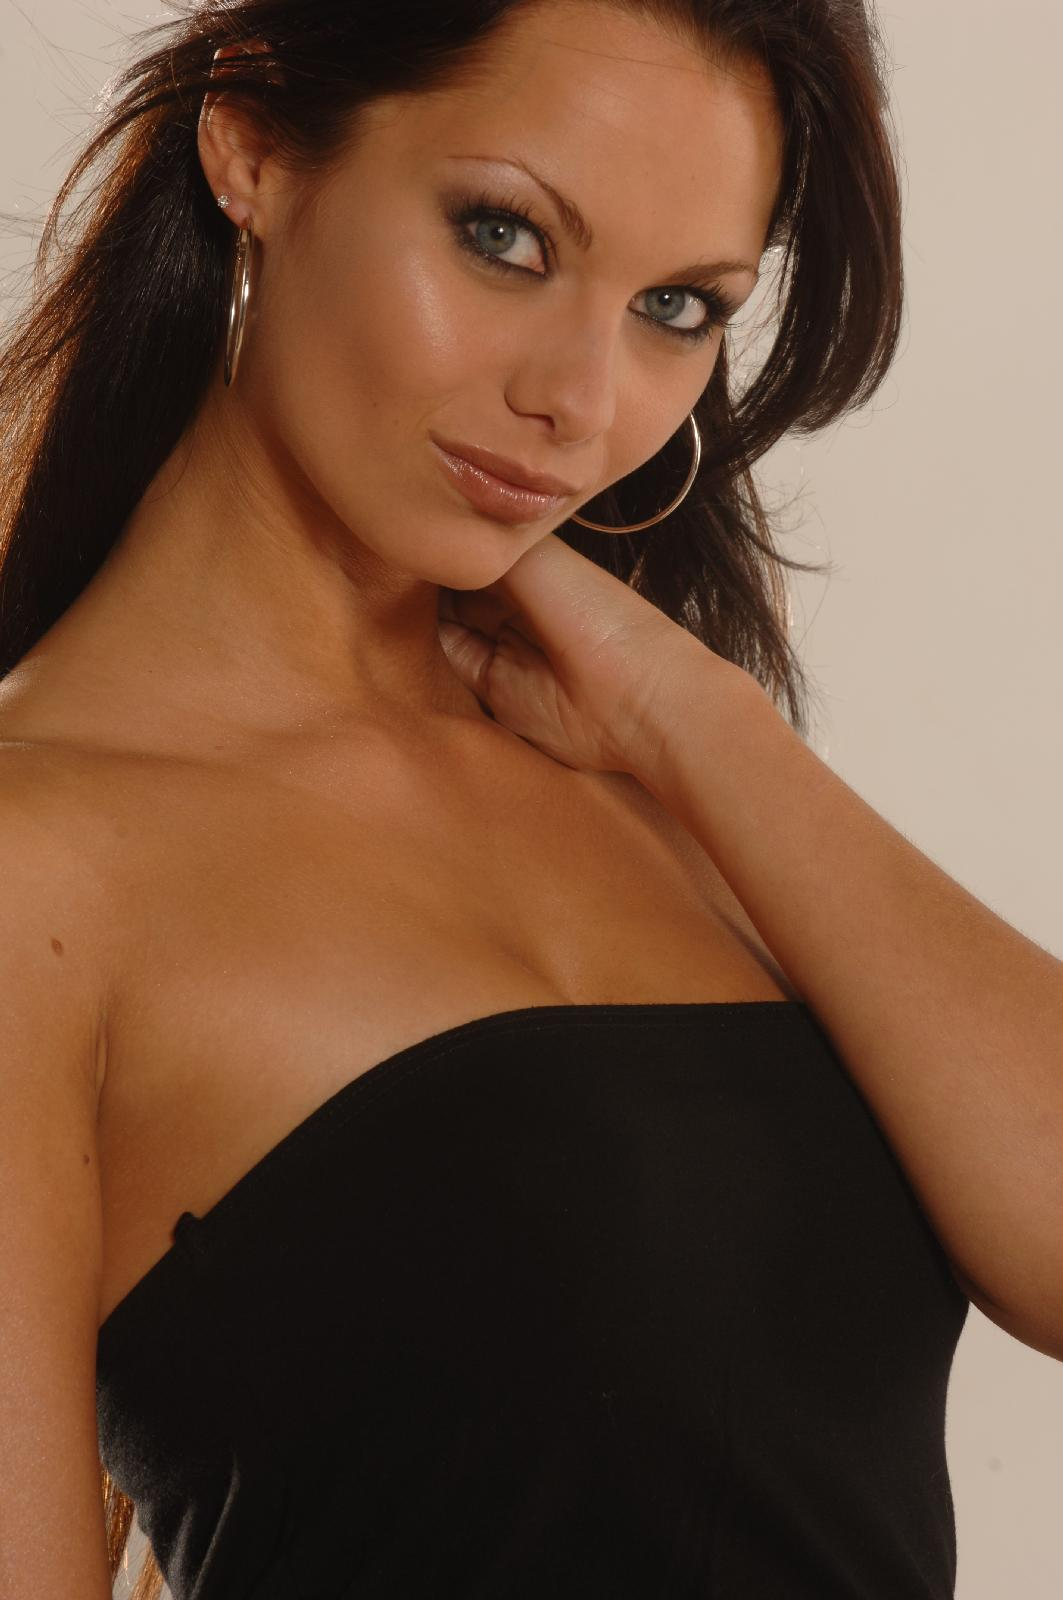 Jessica Jane Clement - Photo Set